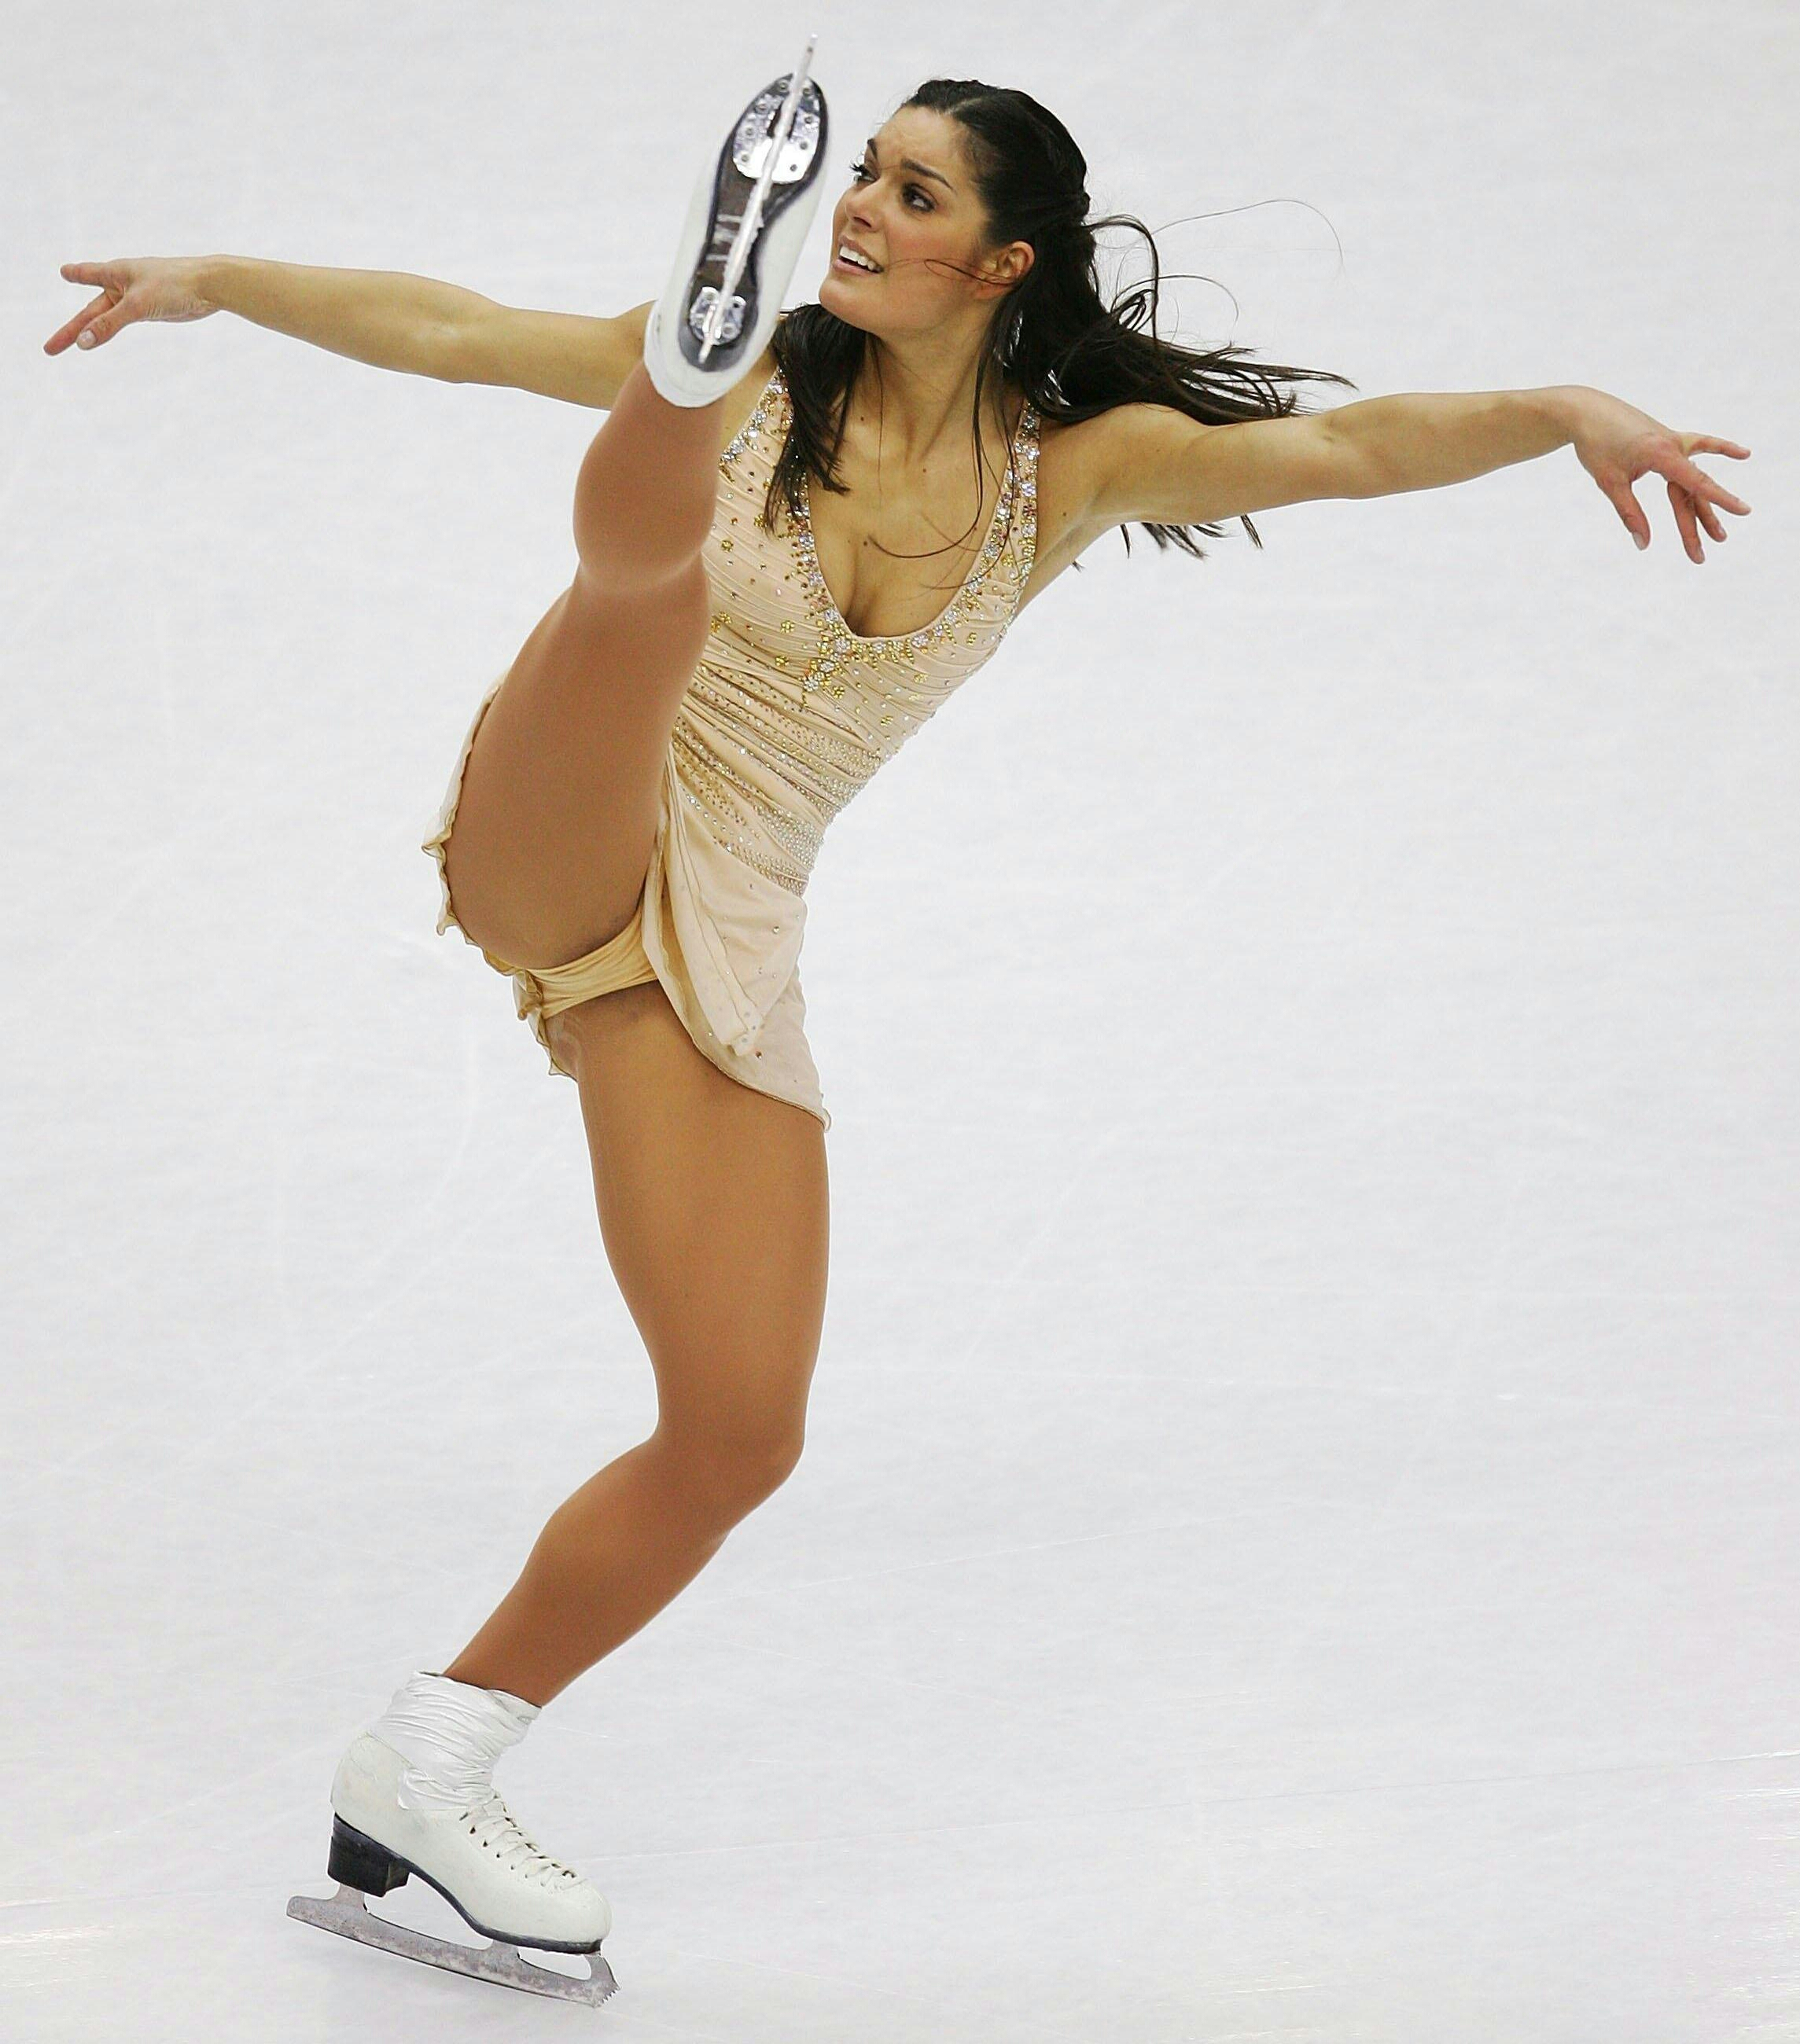 Nude skating ice girls